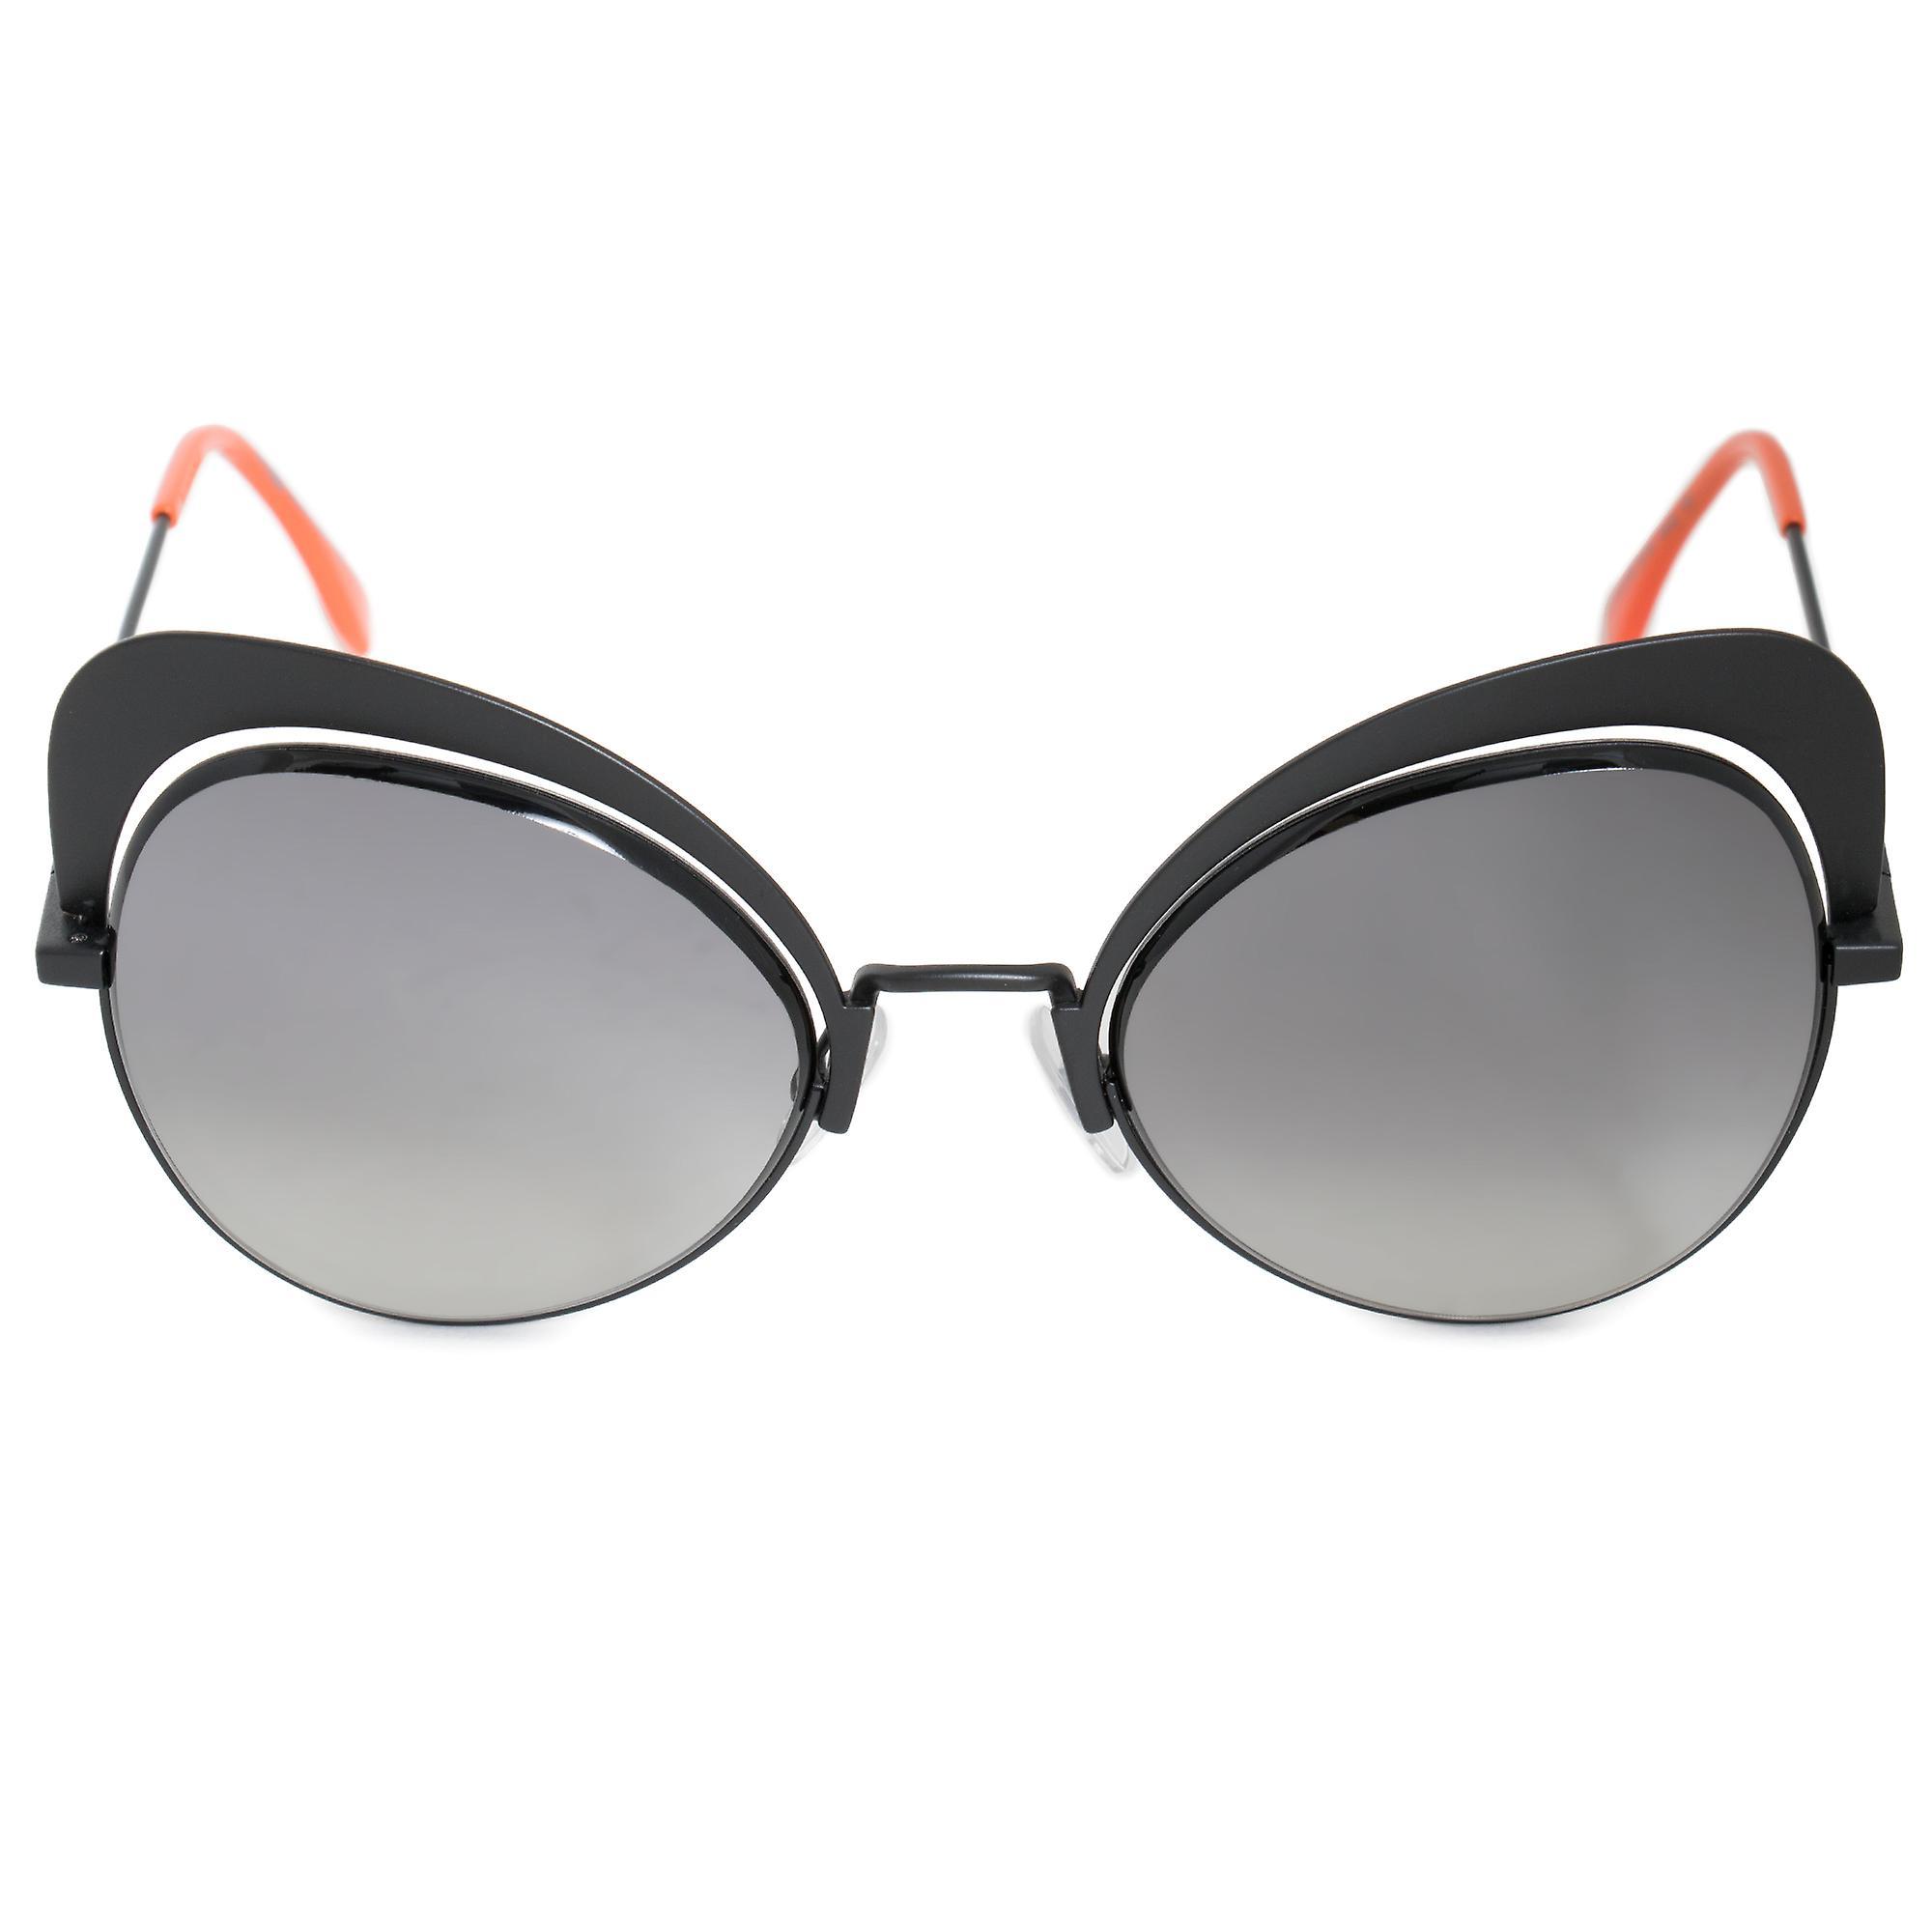 f8899d11b92 Fendi Eyeshine Butterfly Sunglasses FF0247S 807 9O 54